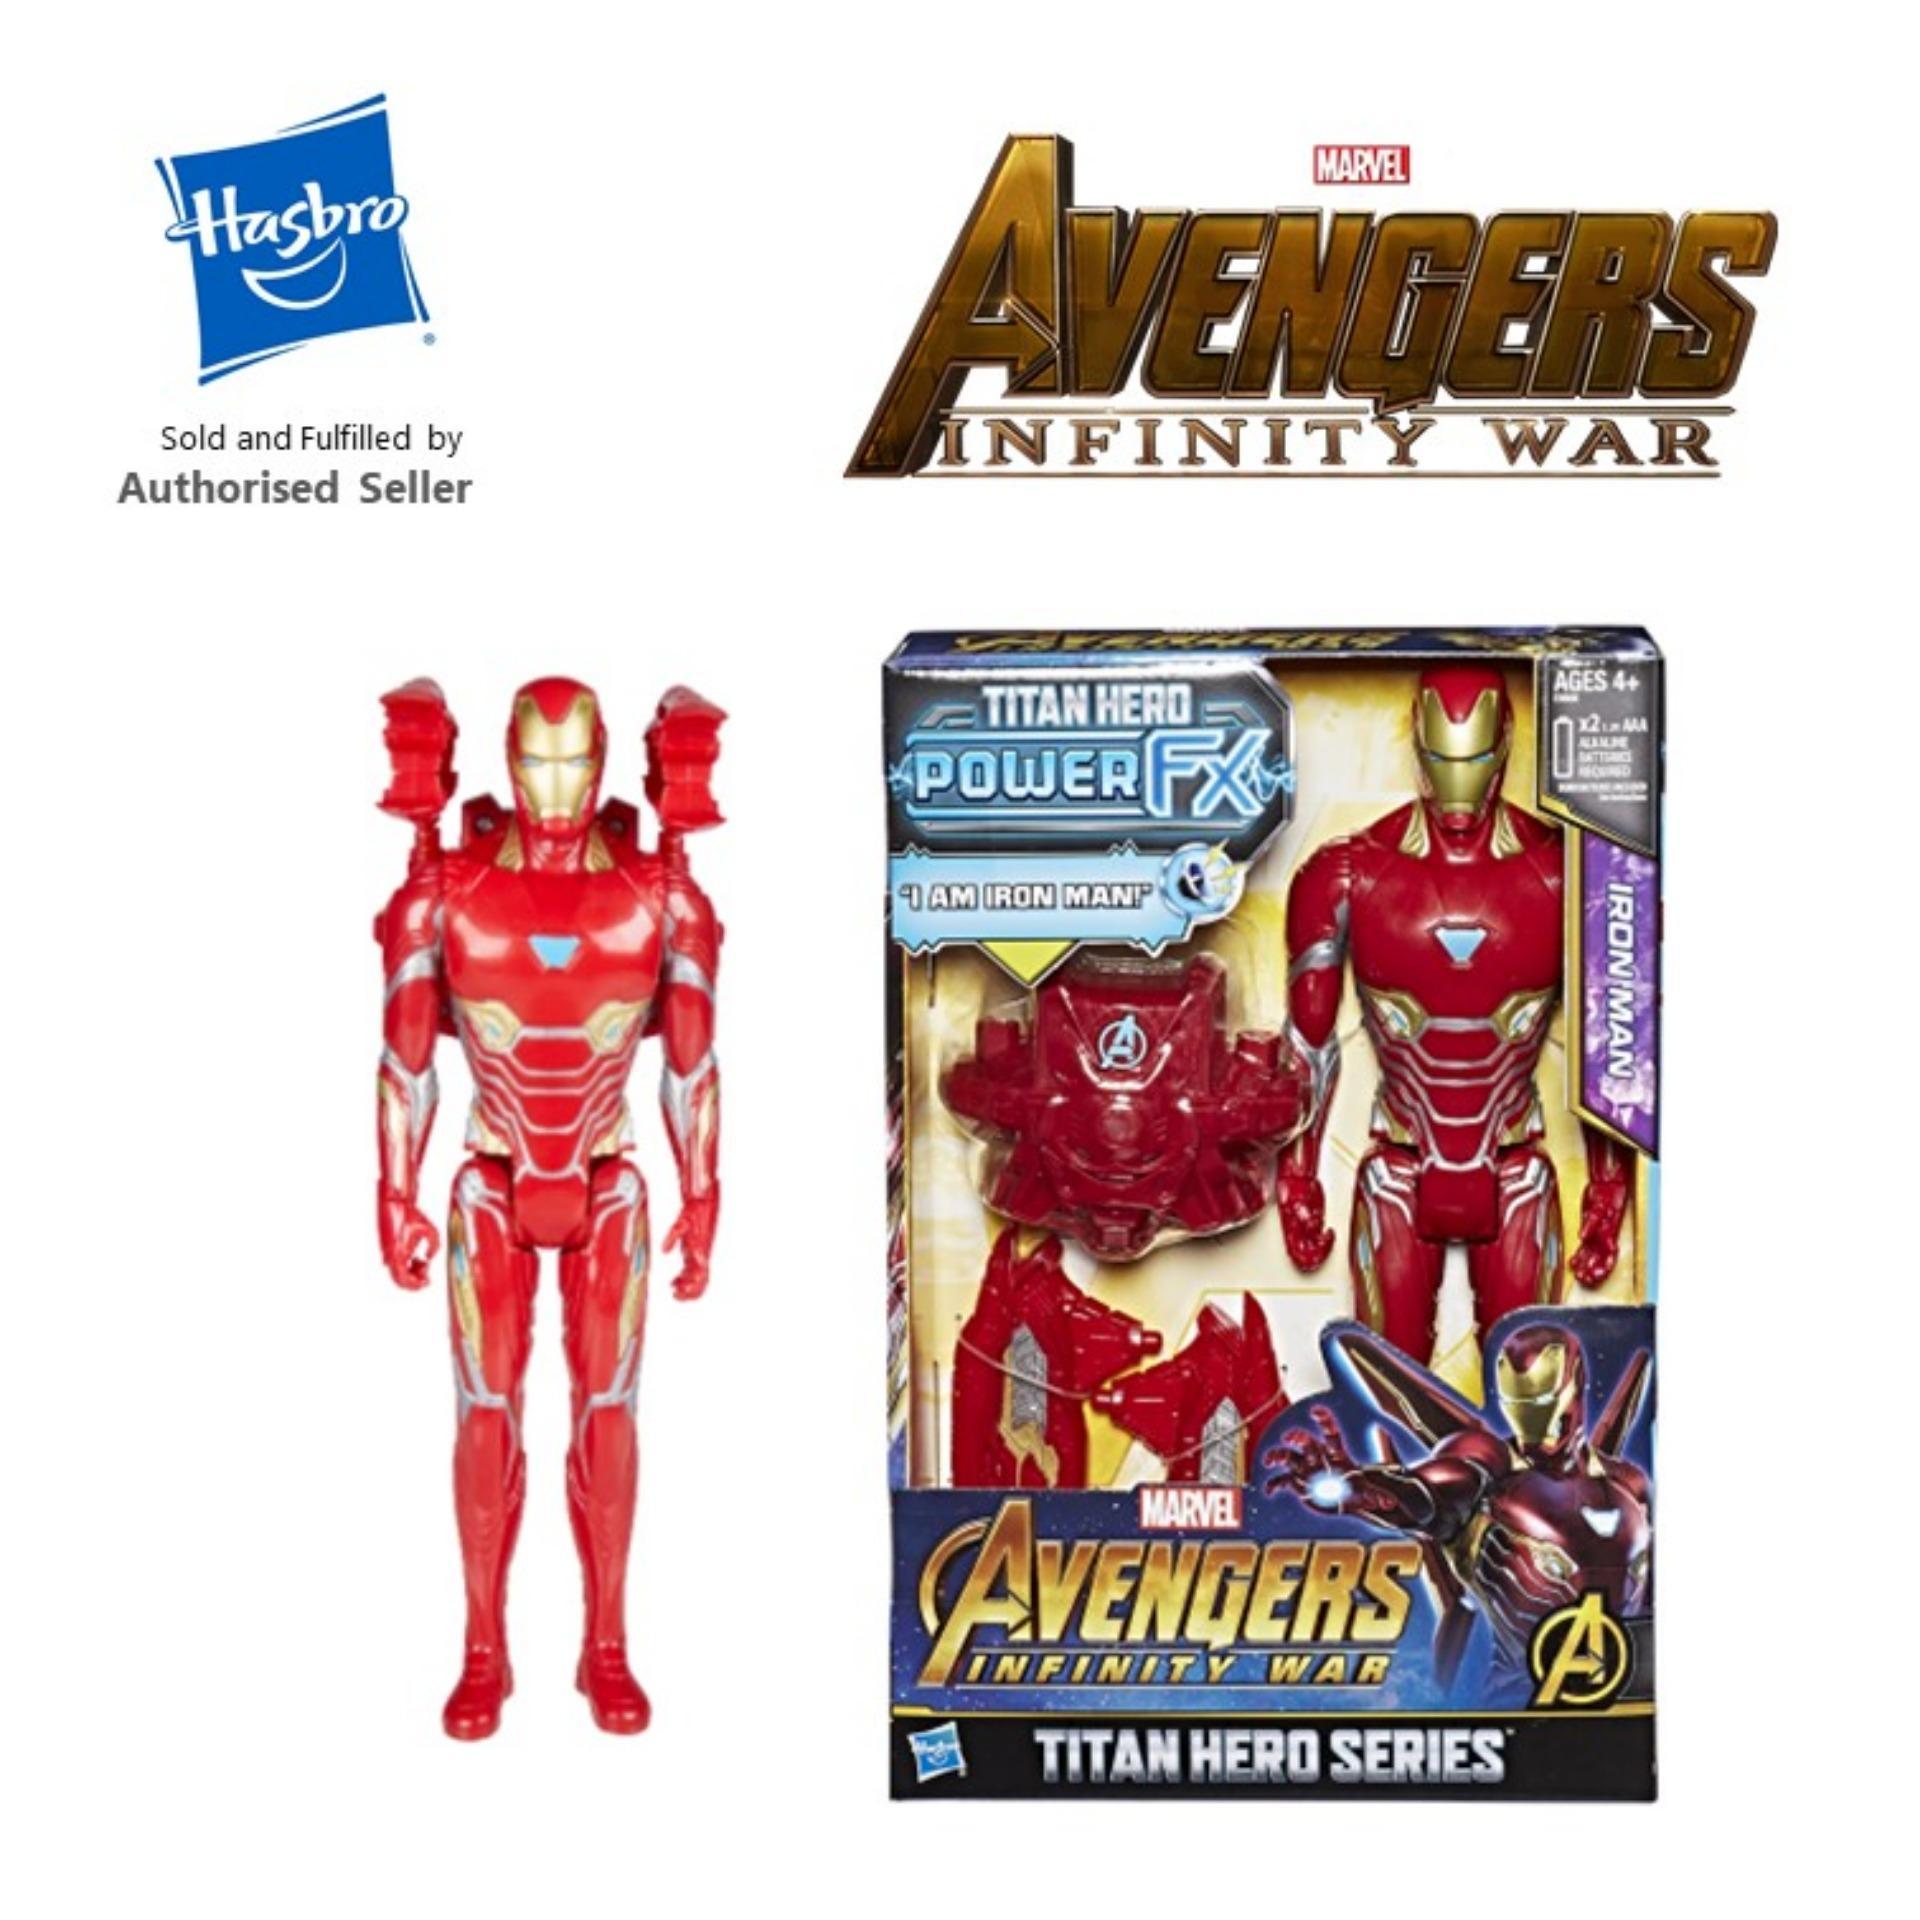 Hasbro Marvel Infinity War : Titan Hero Power FX Iron Man -E0606